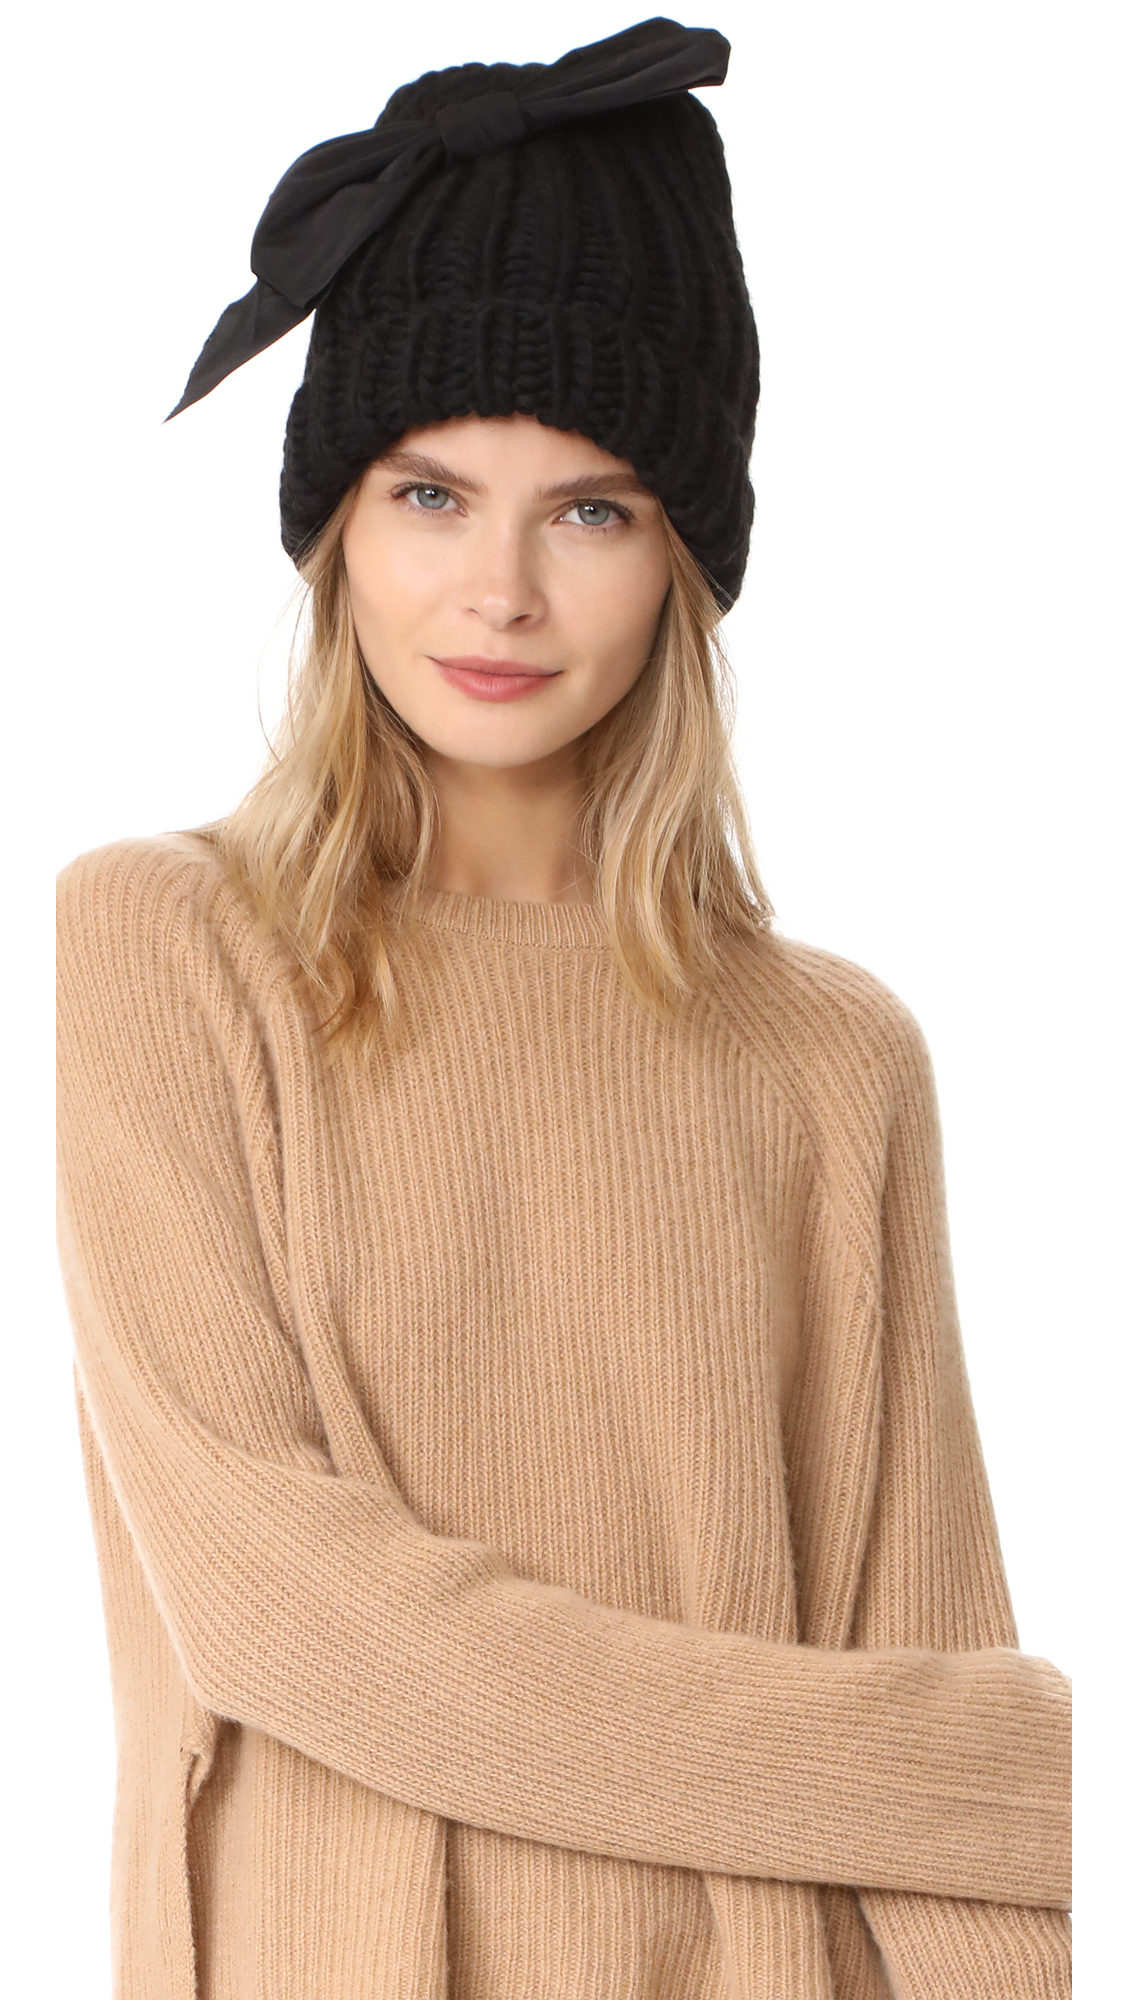 Eugenia Kim Lina Bow Beanie Hat - Black/Black